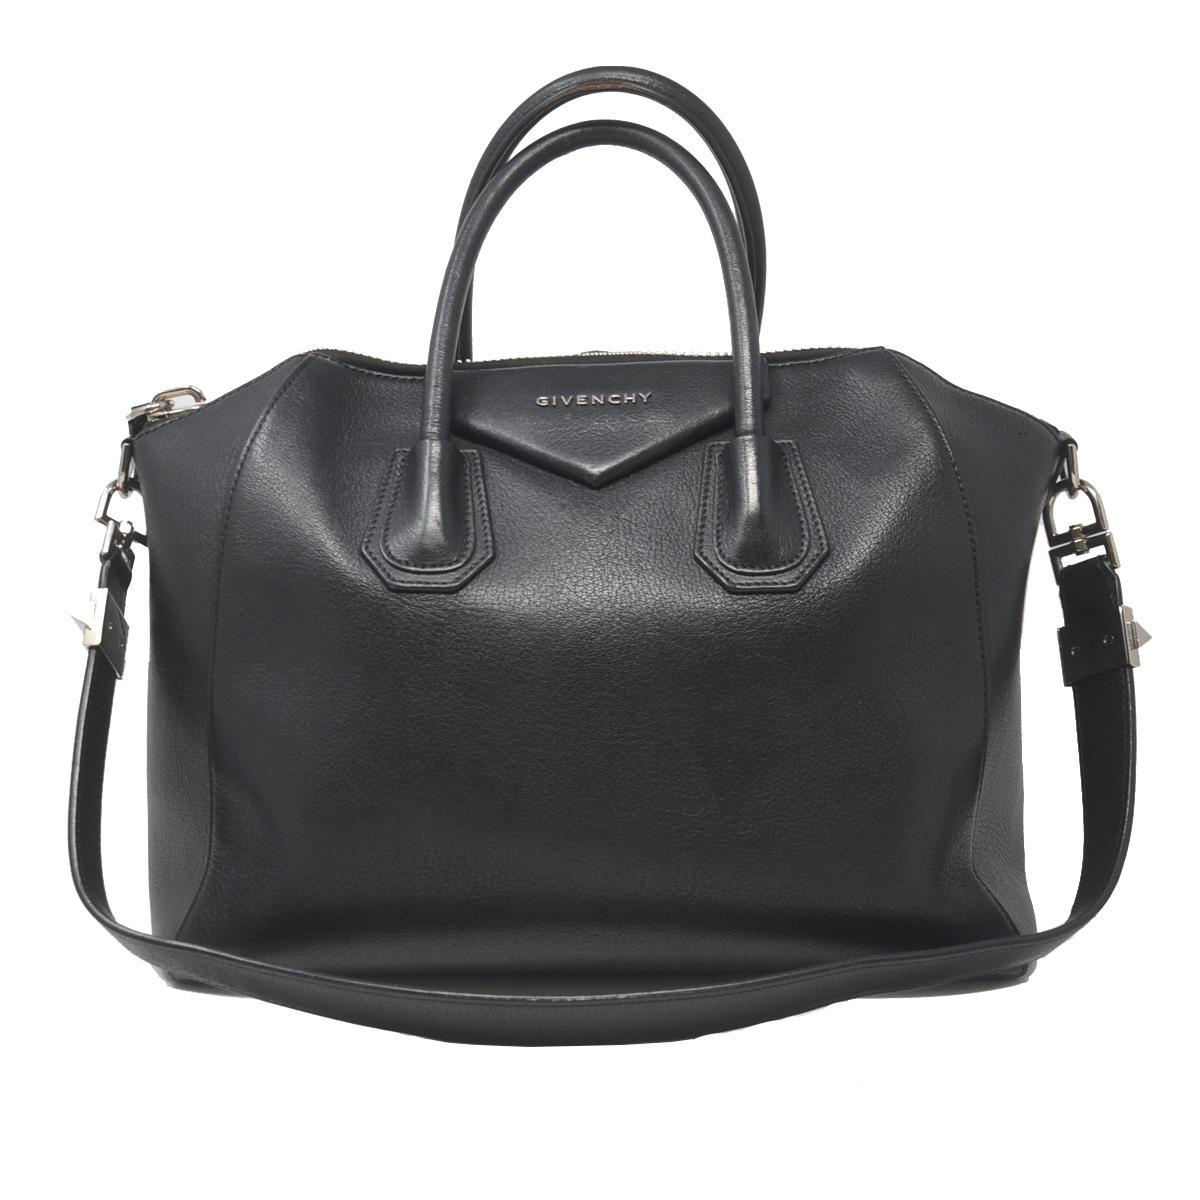 Givenchy Antigona Medium Black Leather Tote Handbag